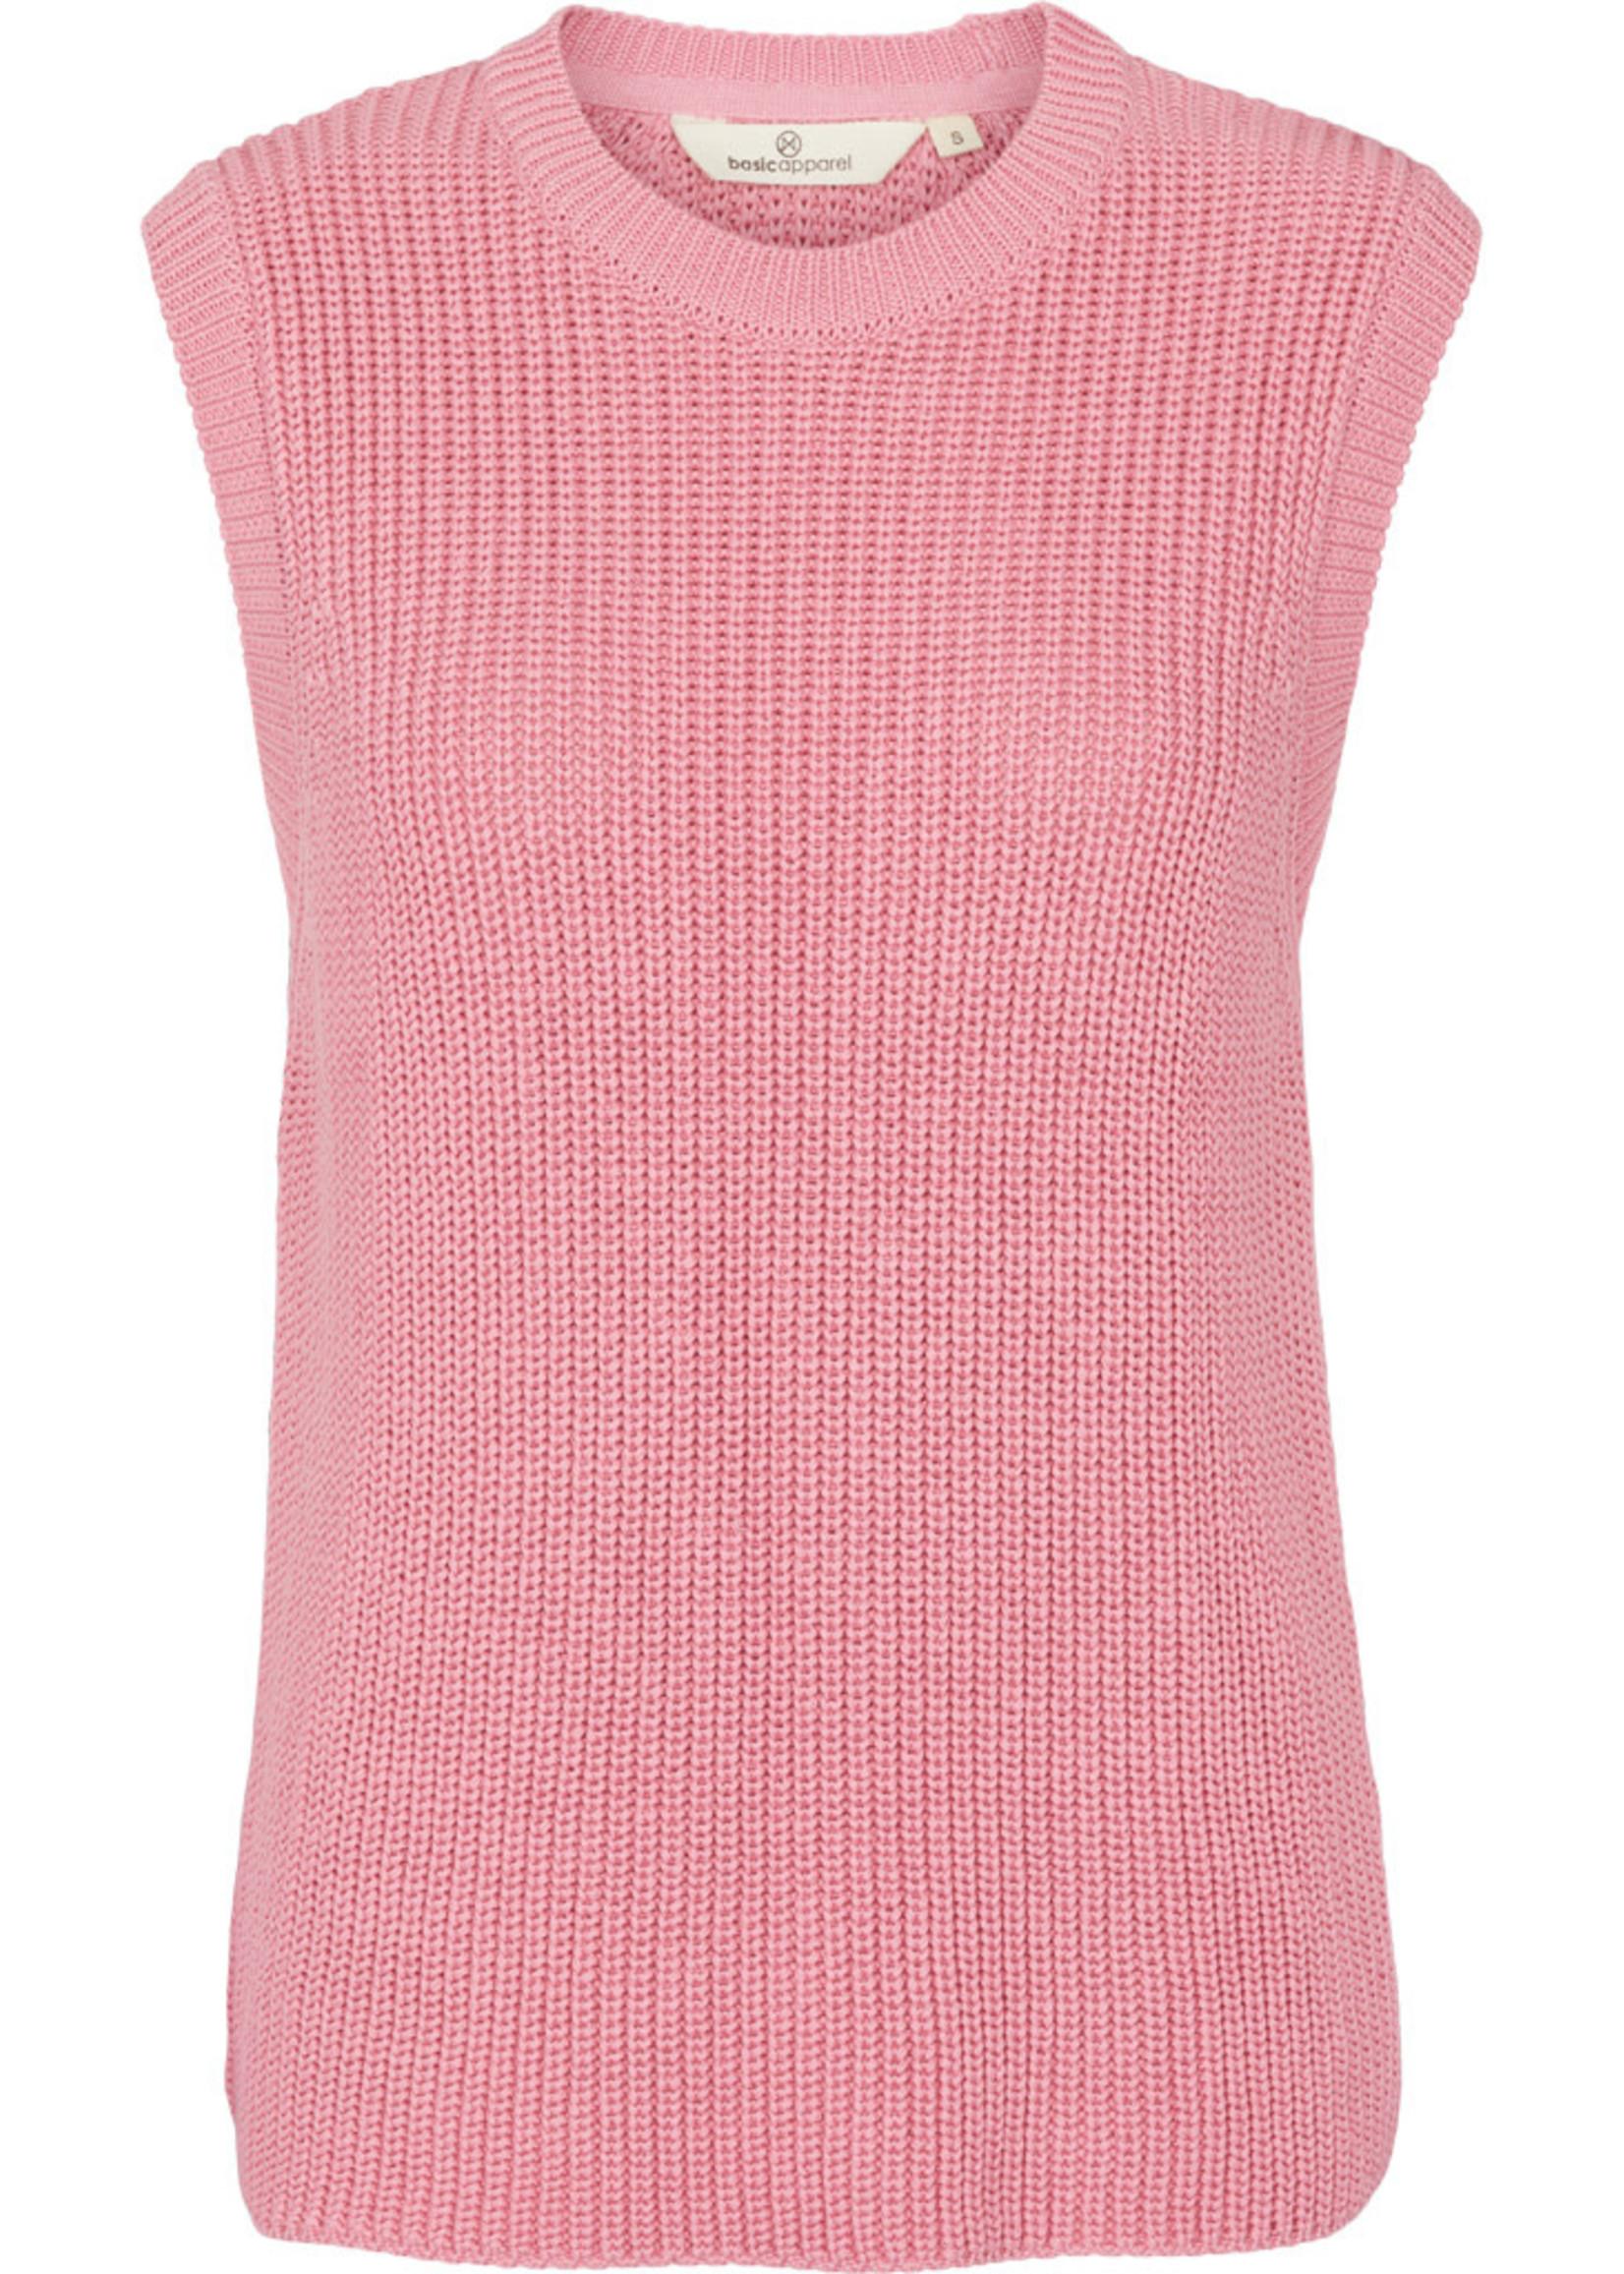 Basic Apparel Sweety Vest